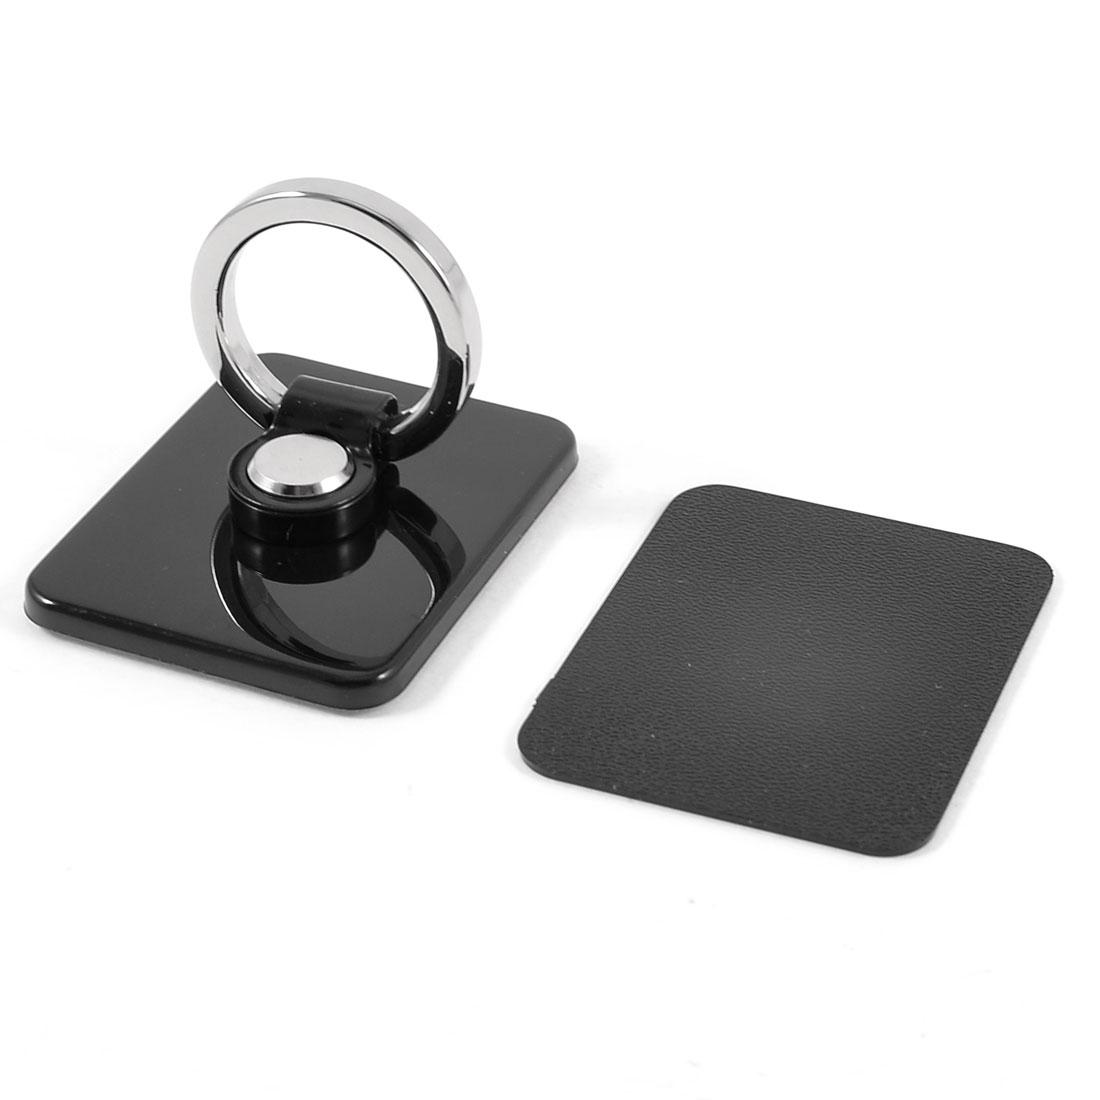 Retangle Black Adhesive Ring Holder for Smart Phone Pad MP5